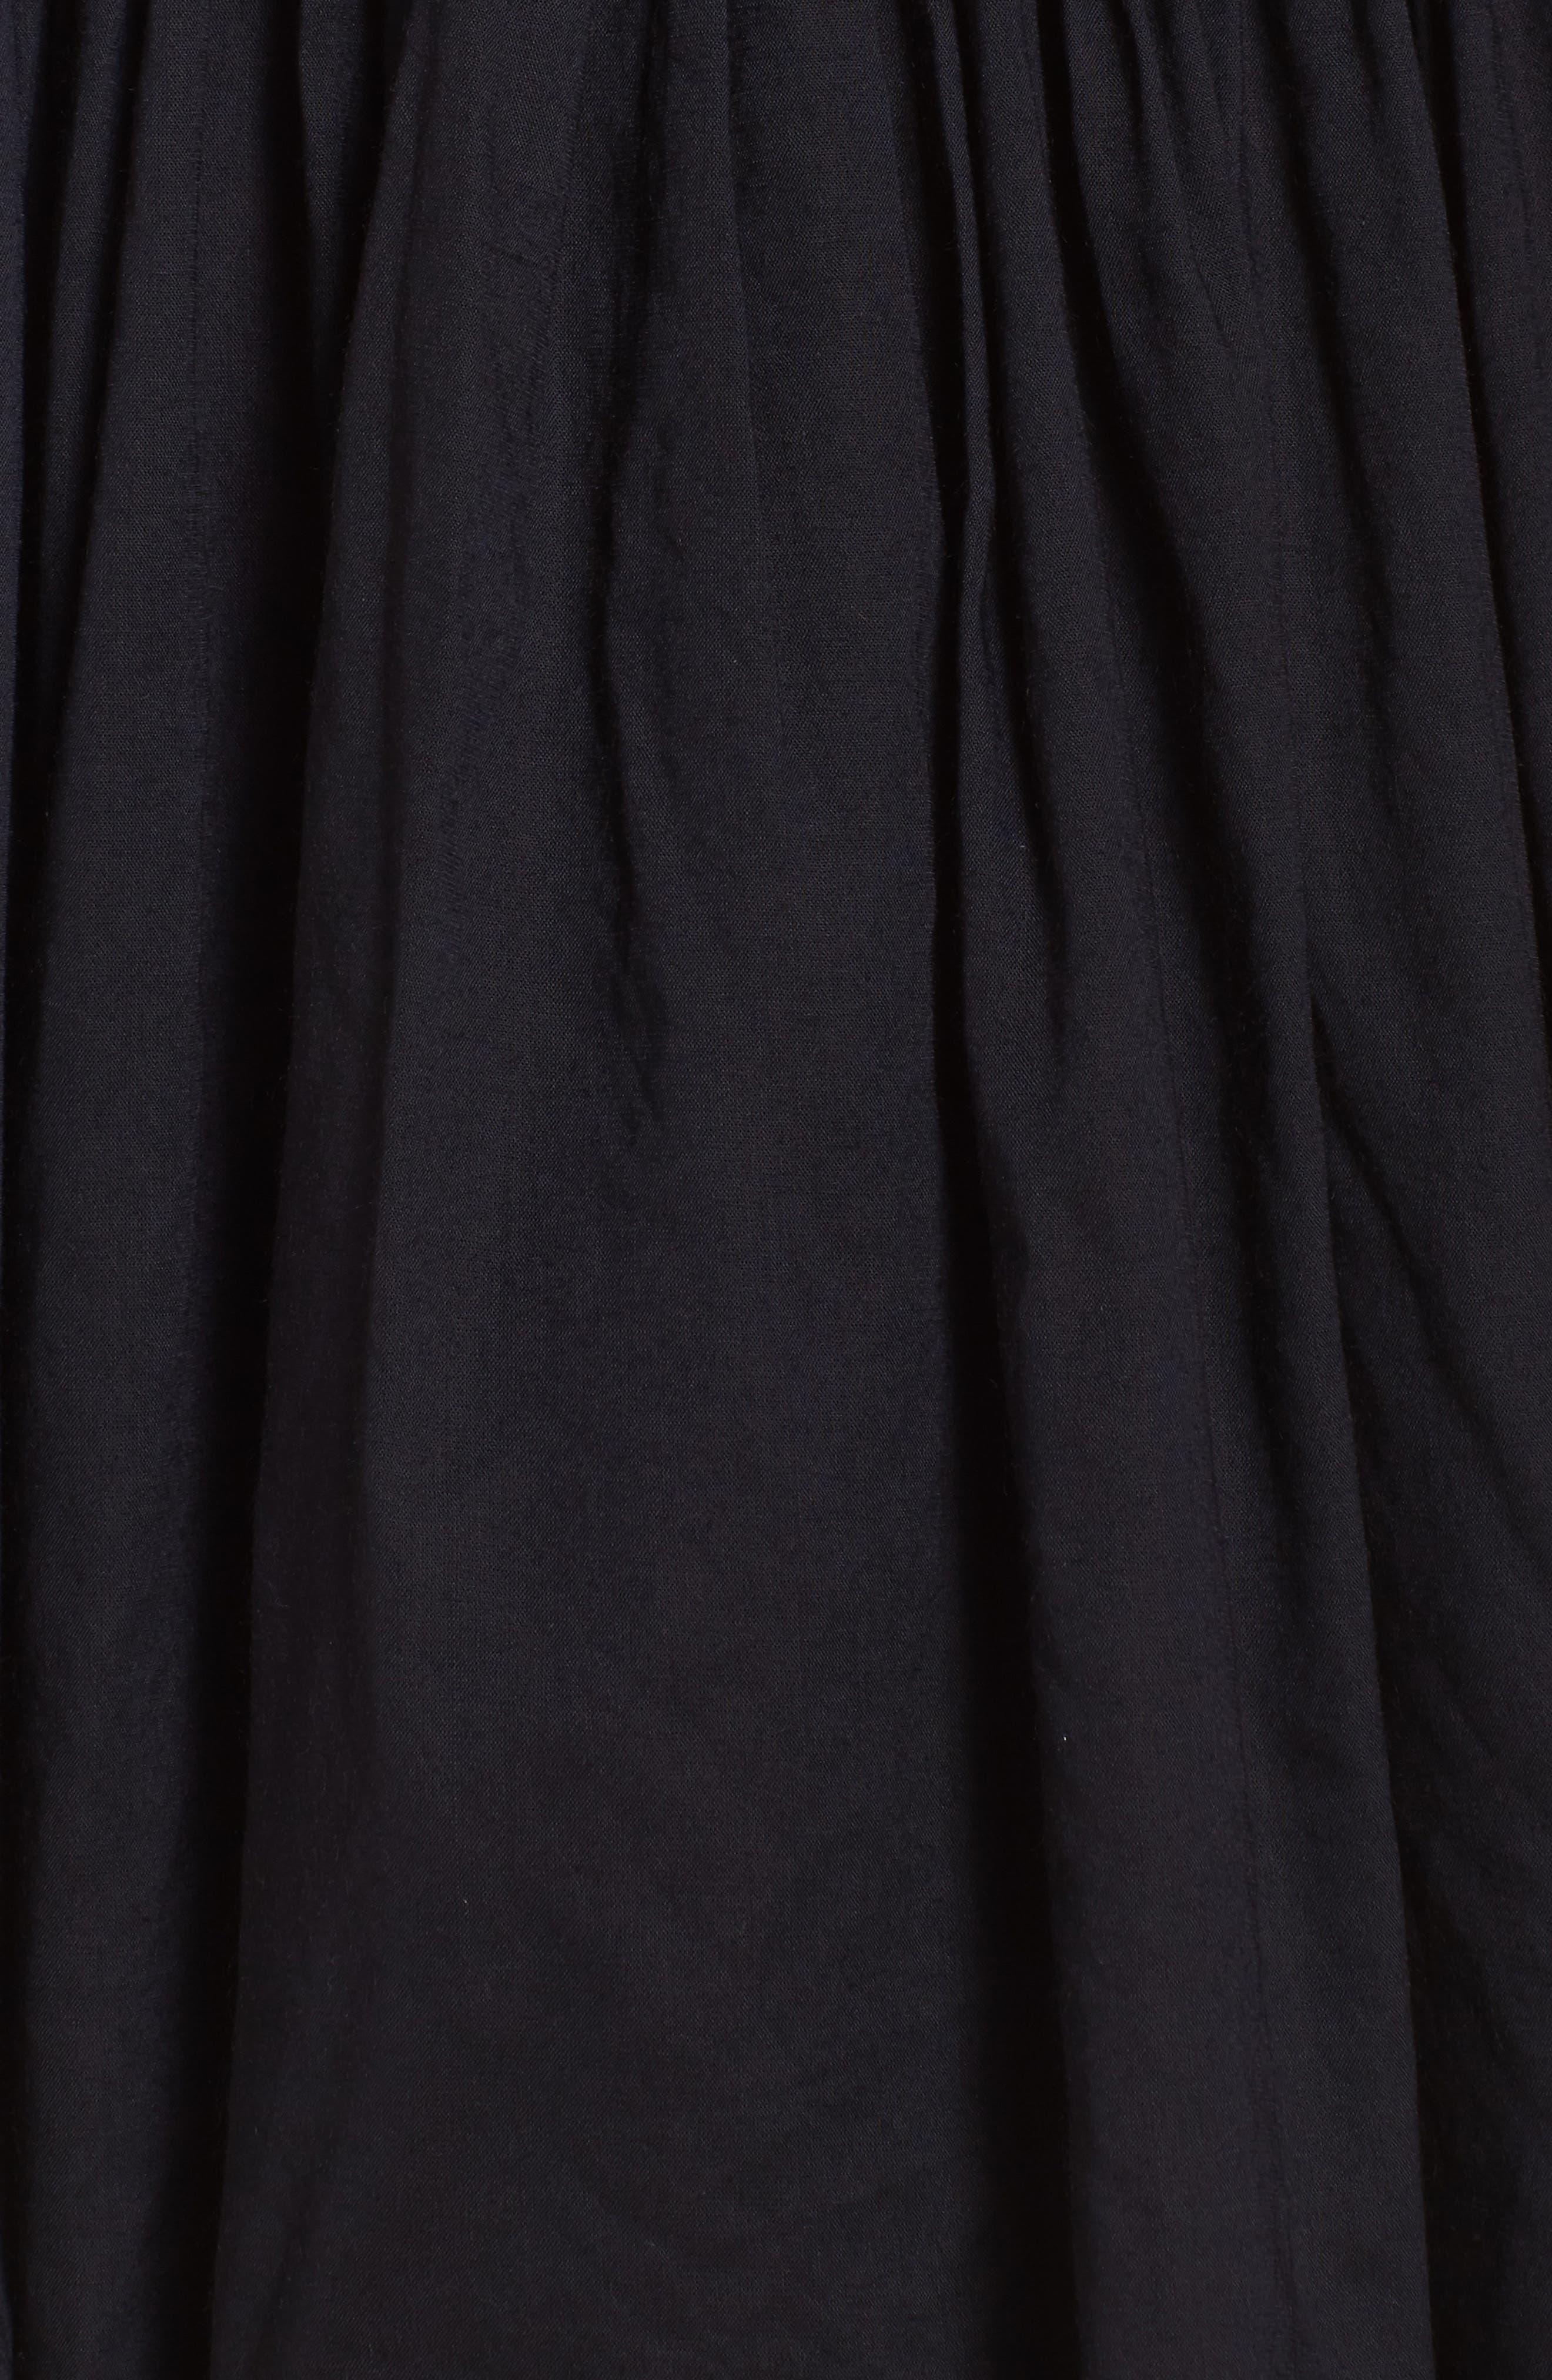 Celeste Cover-Up Dress,                             Alternate thumbnail 5, color,                             001